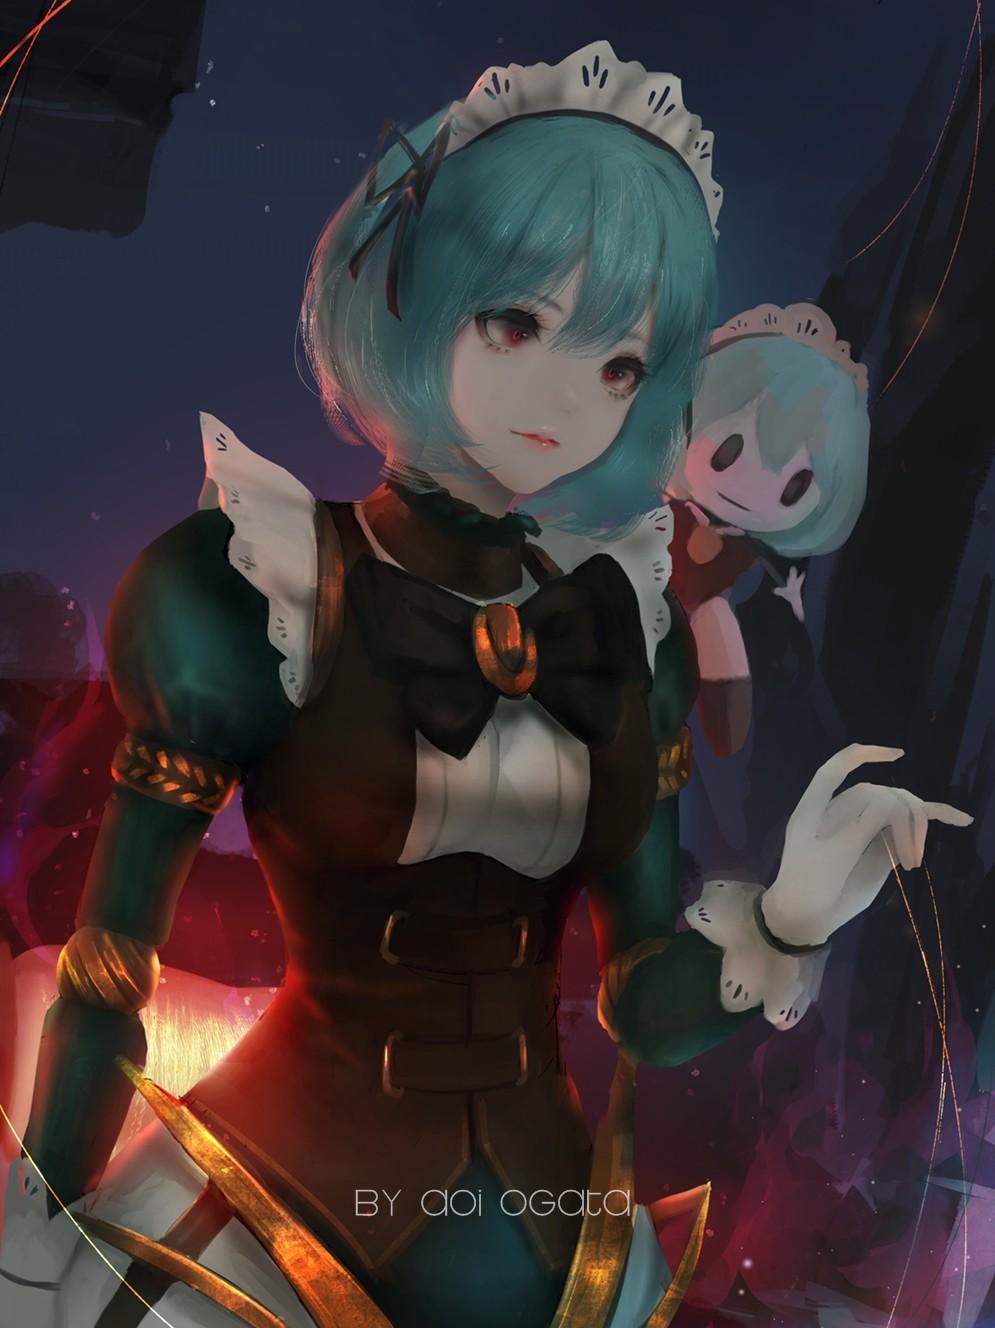 ArtStation - Angela - Mobile Legends, Aoi Ogata